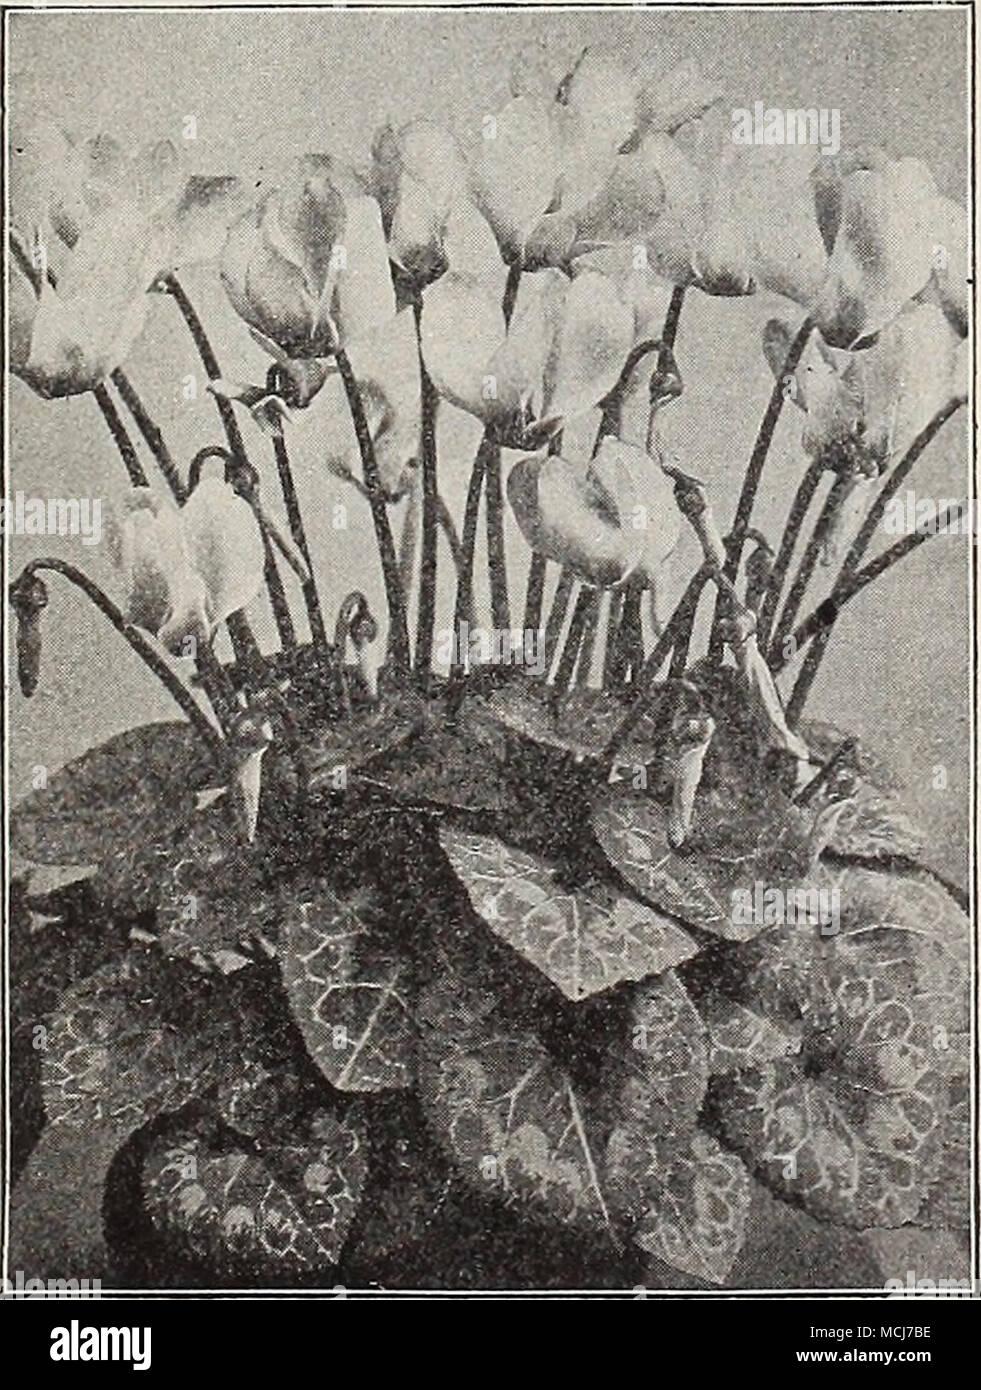 Pkt Is 10 20 25 Giant Cyclamen Chrysanthemum Per Maximum King